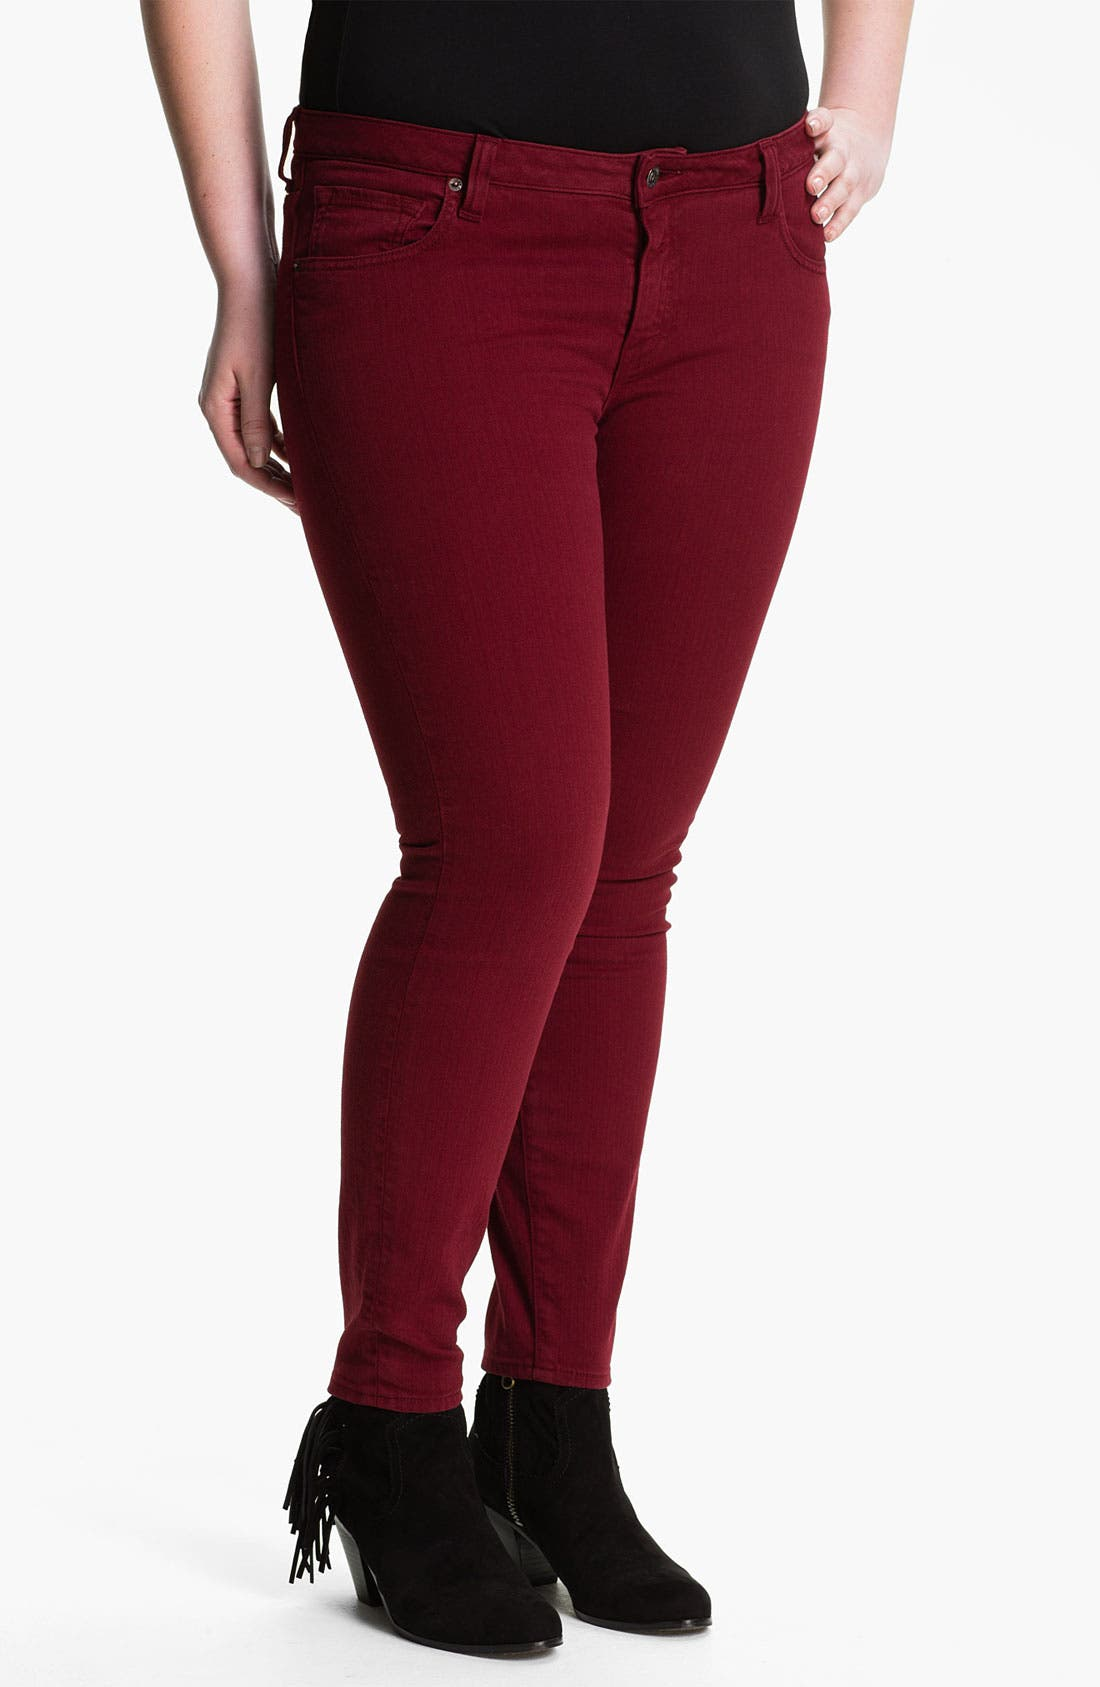 Alternate Image 1 Selected - Lucky Brand 'Ginger' Skinny Jeans (Plus)